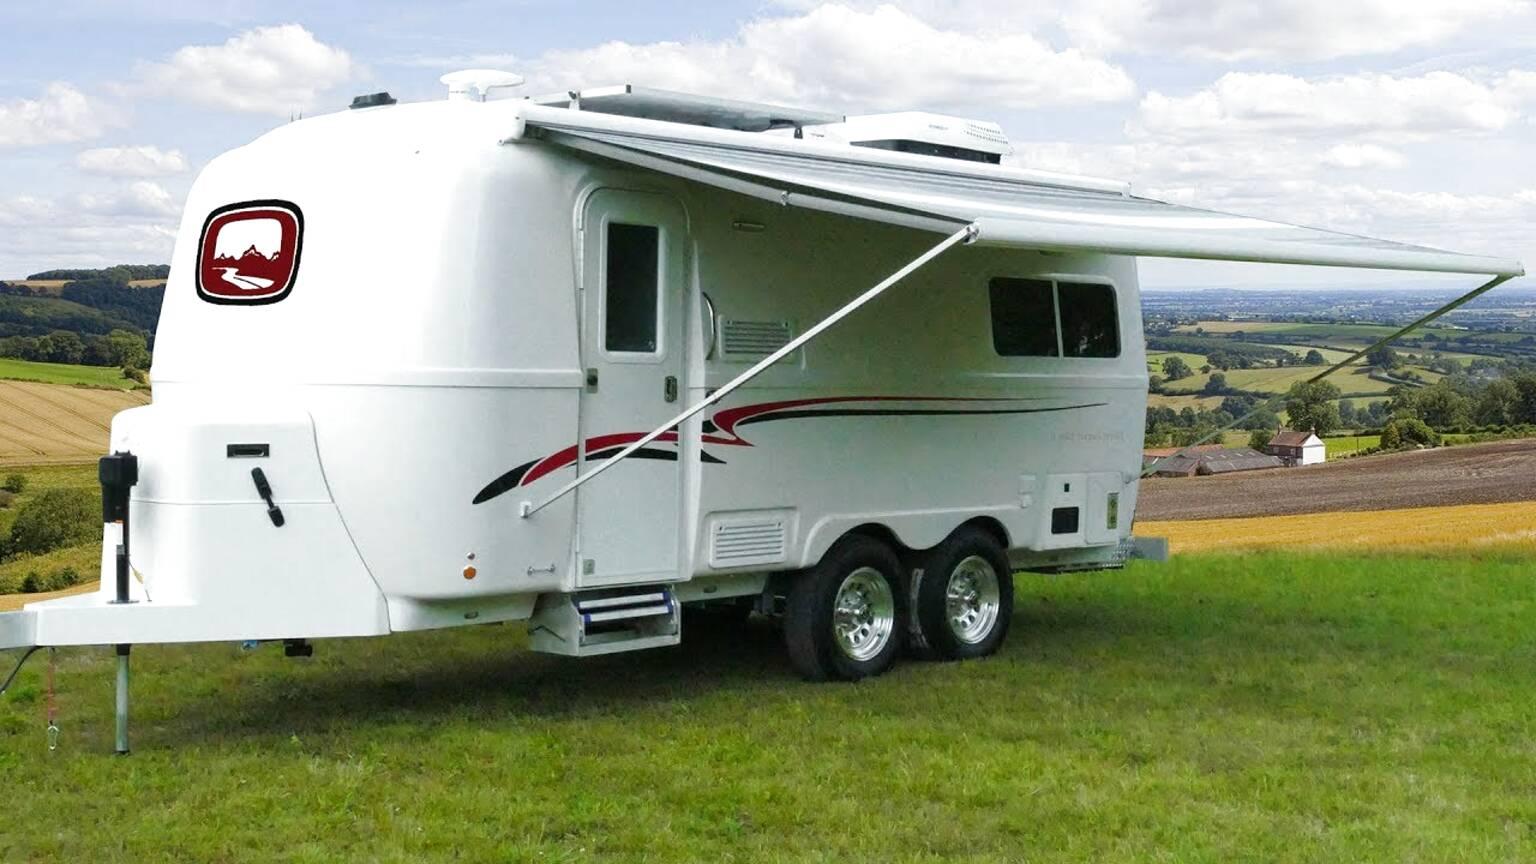 Fiberglass Camper for sale in UK   View 58 bargains